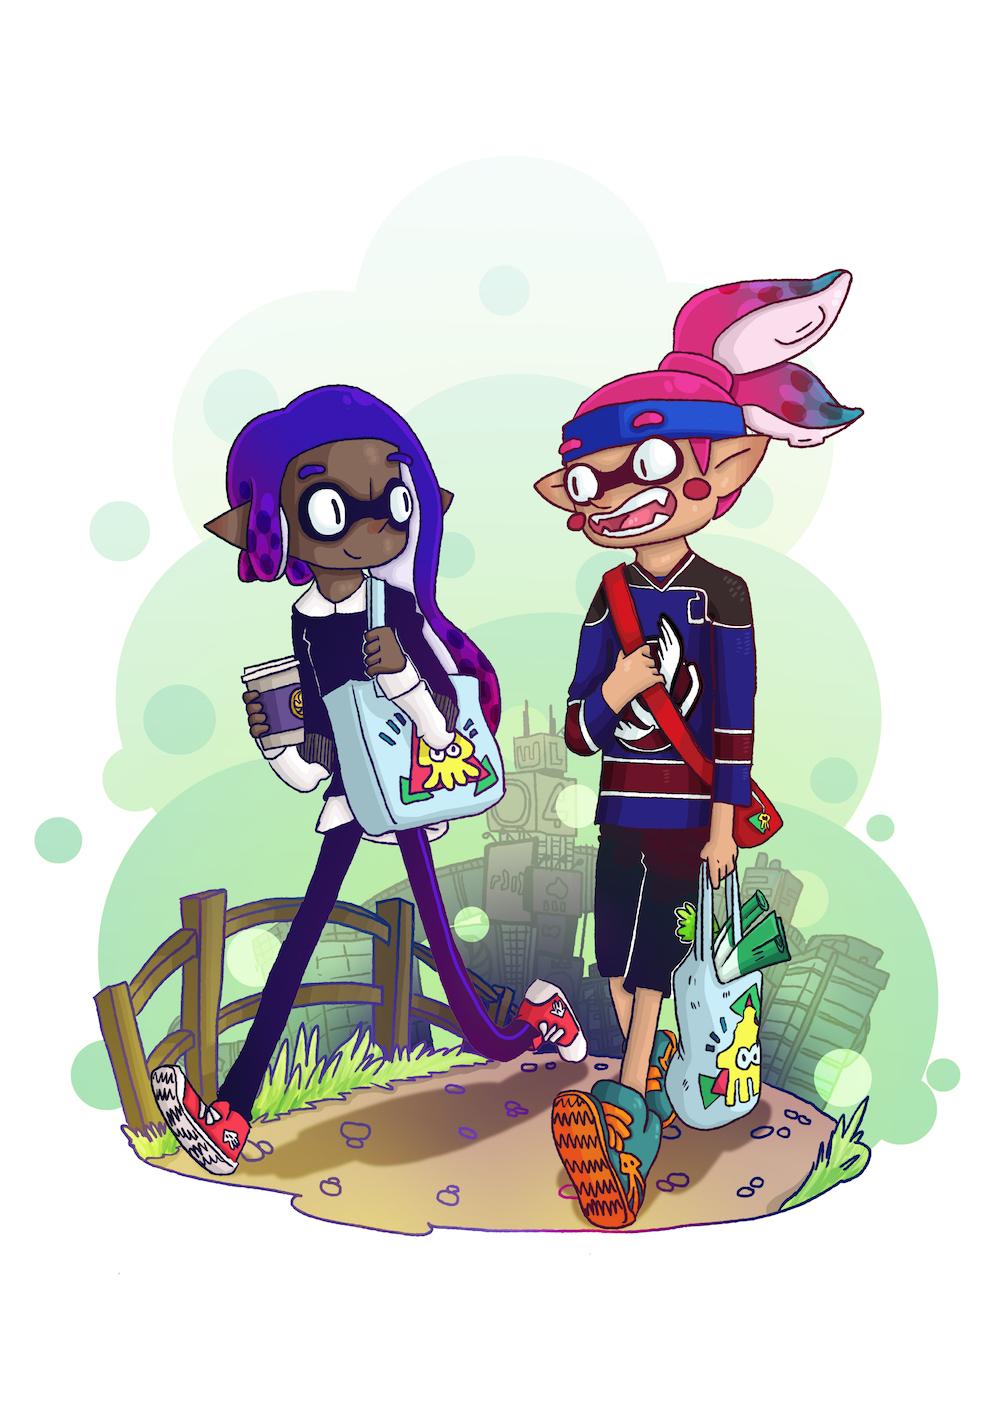 shopping squids 1st try copy 2.jpg